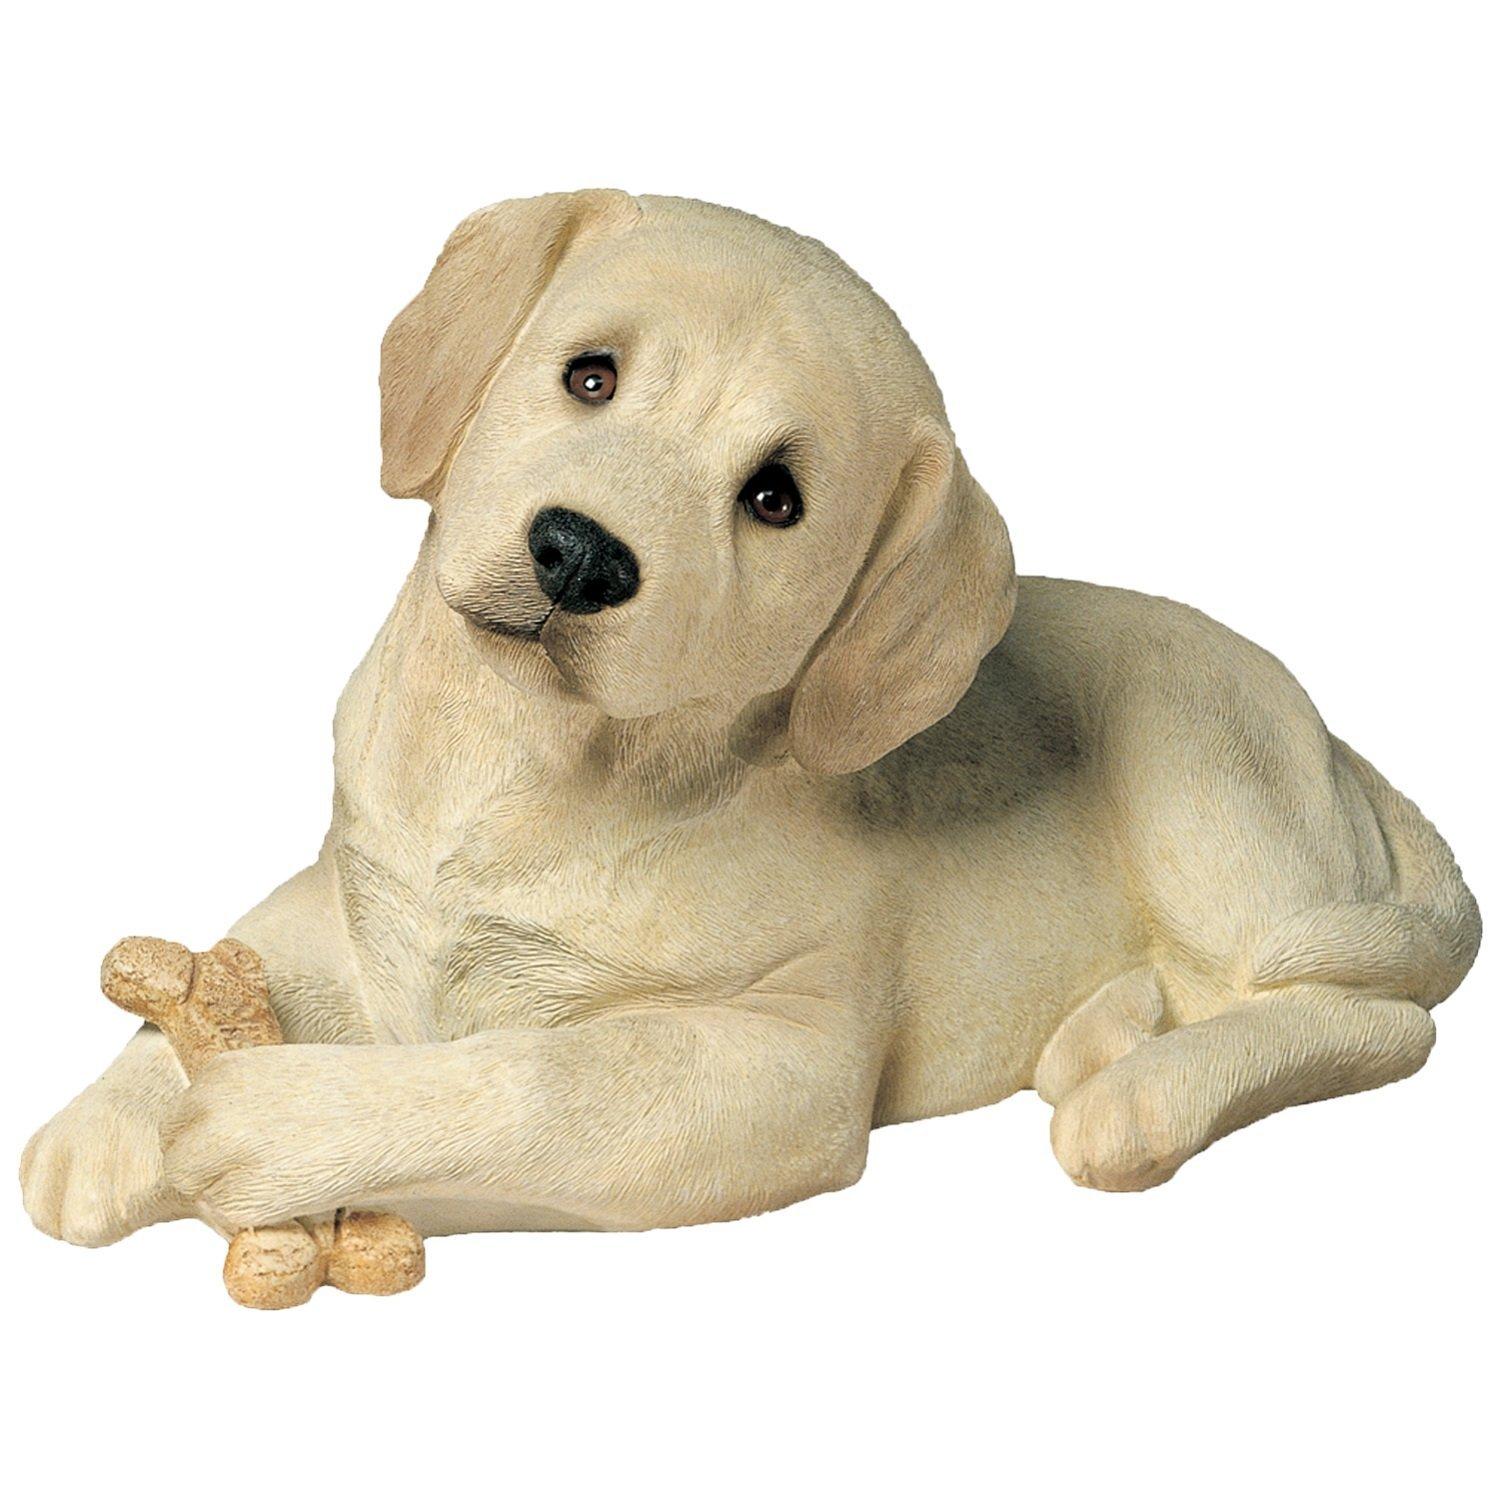 Sandicast Life Size Lying Yellow Labrador Retriever Pup Dog Sculpture